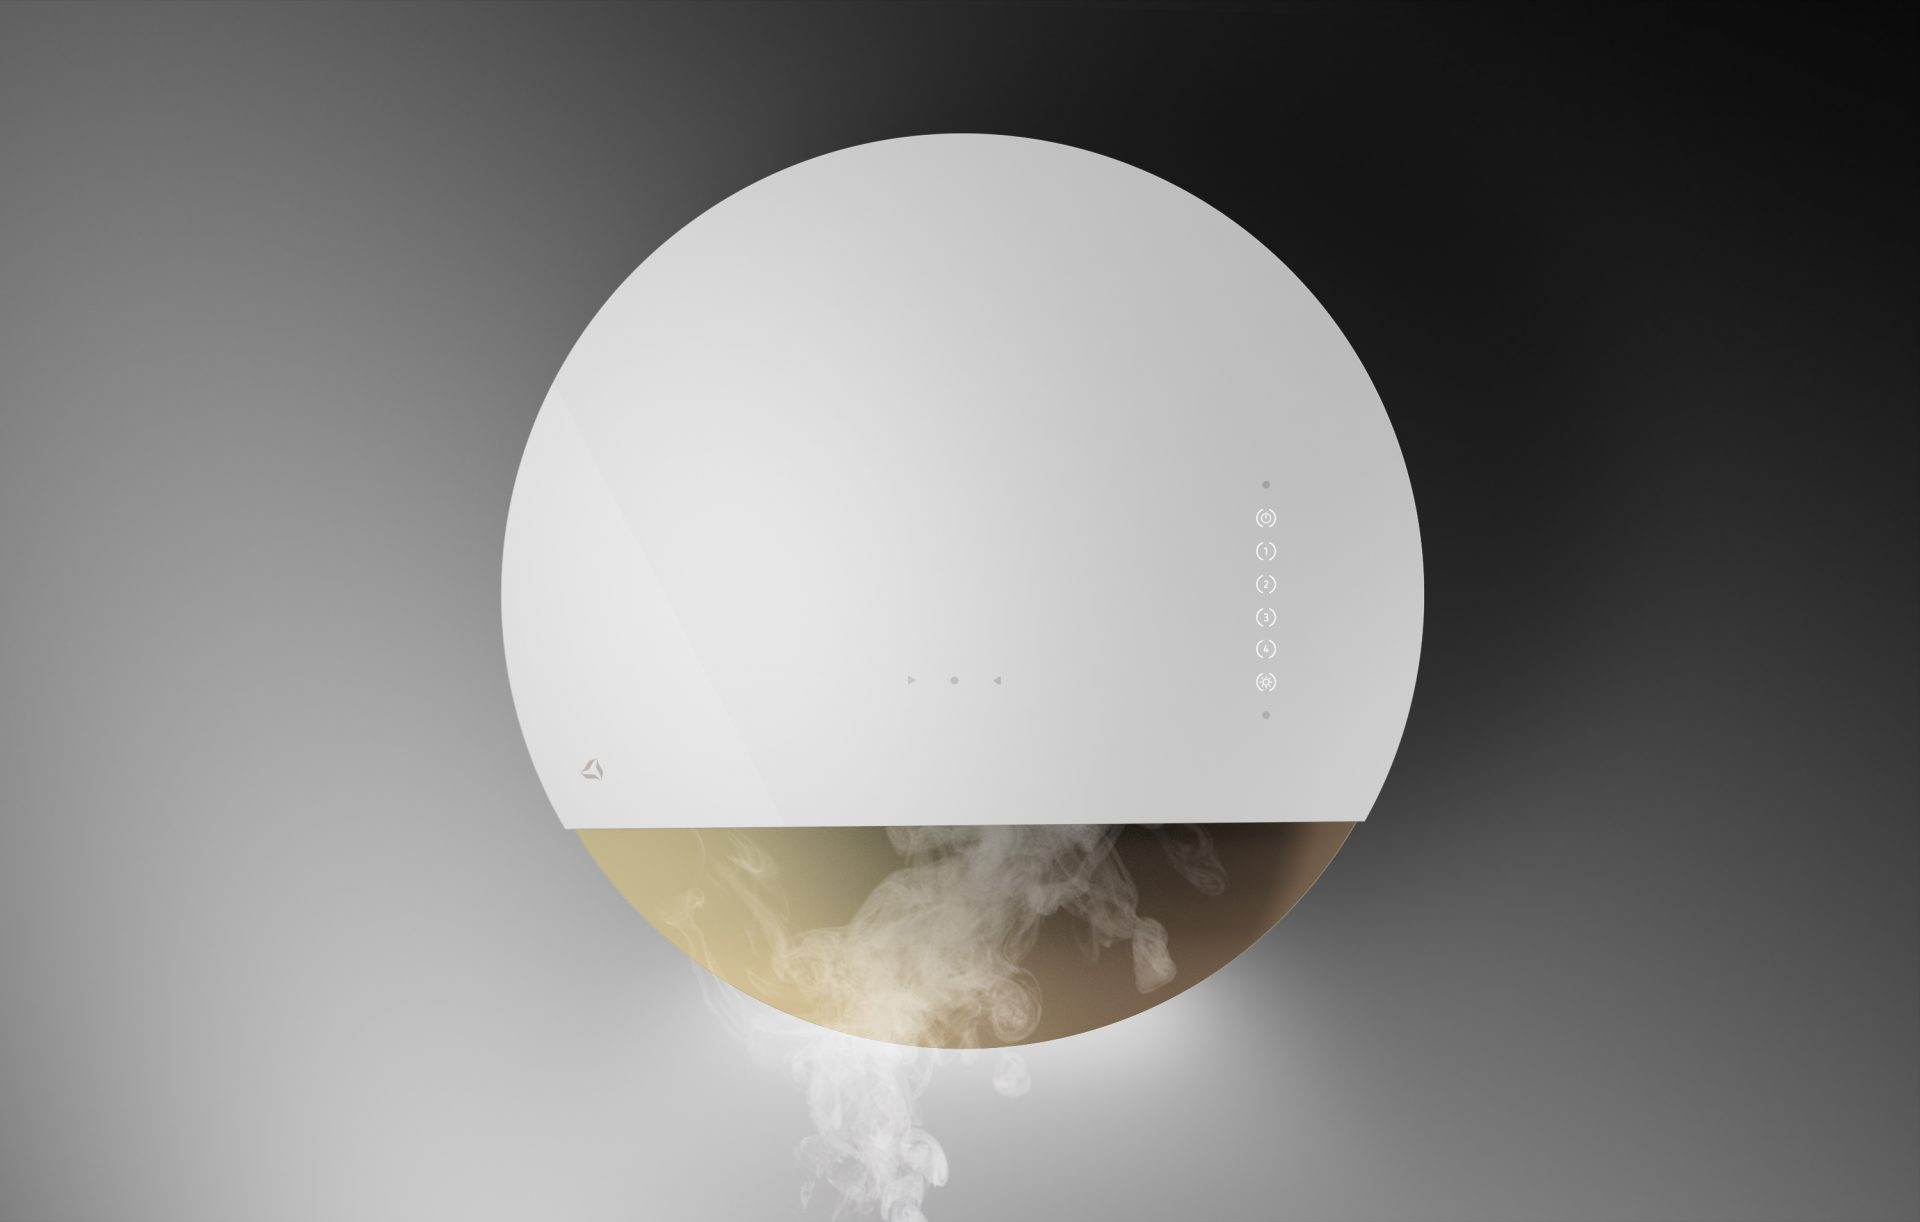 eclipse-producent-ciarko-design-projektant-ukasz-paszkowski-3_51159857241_o